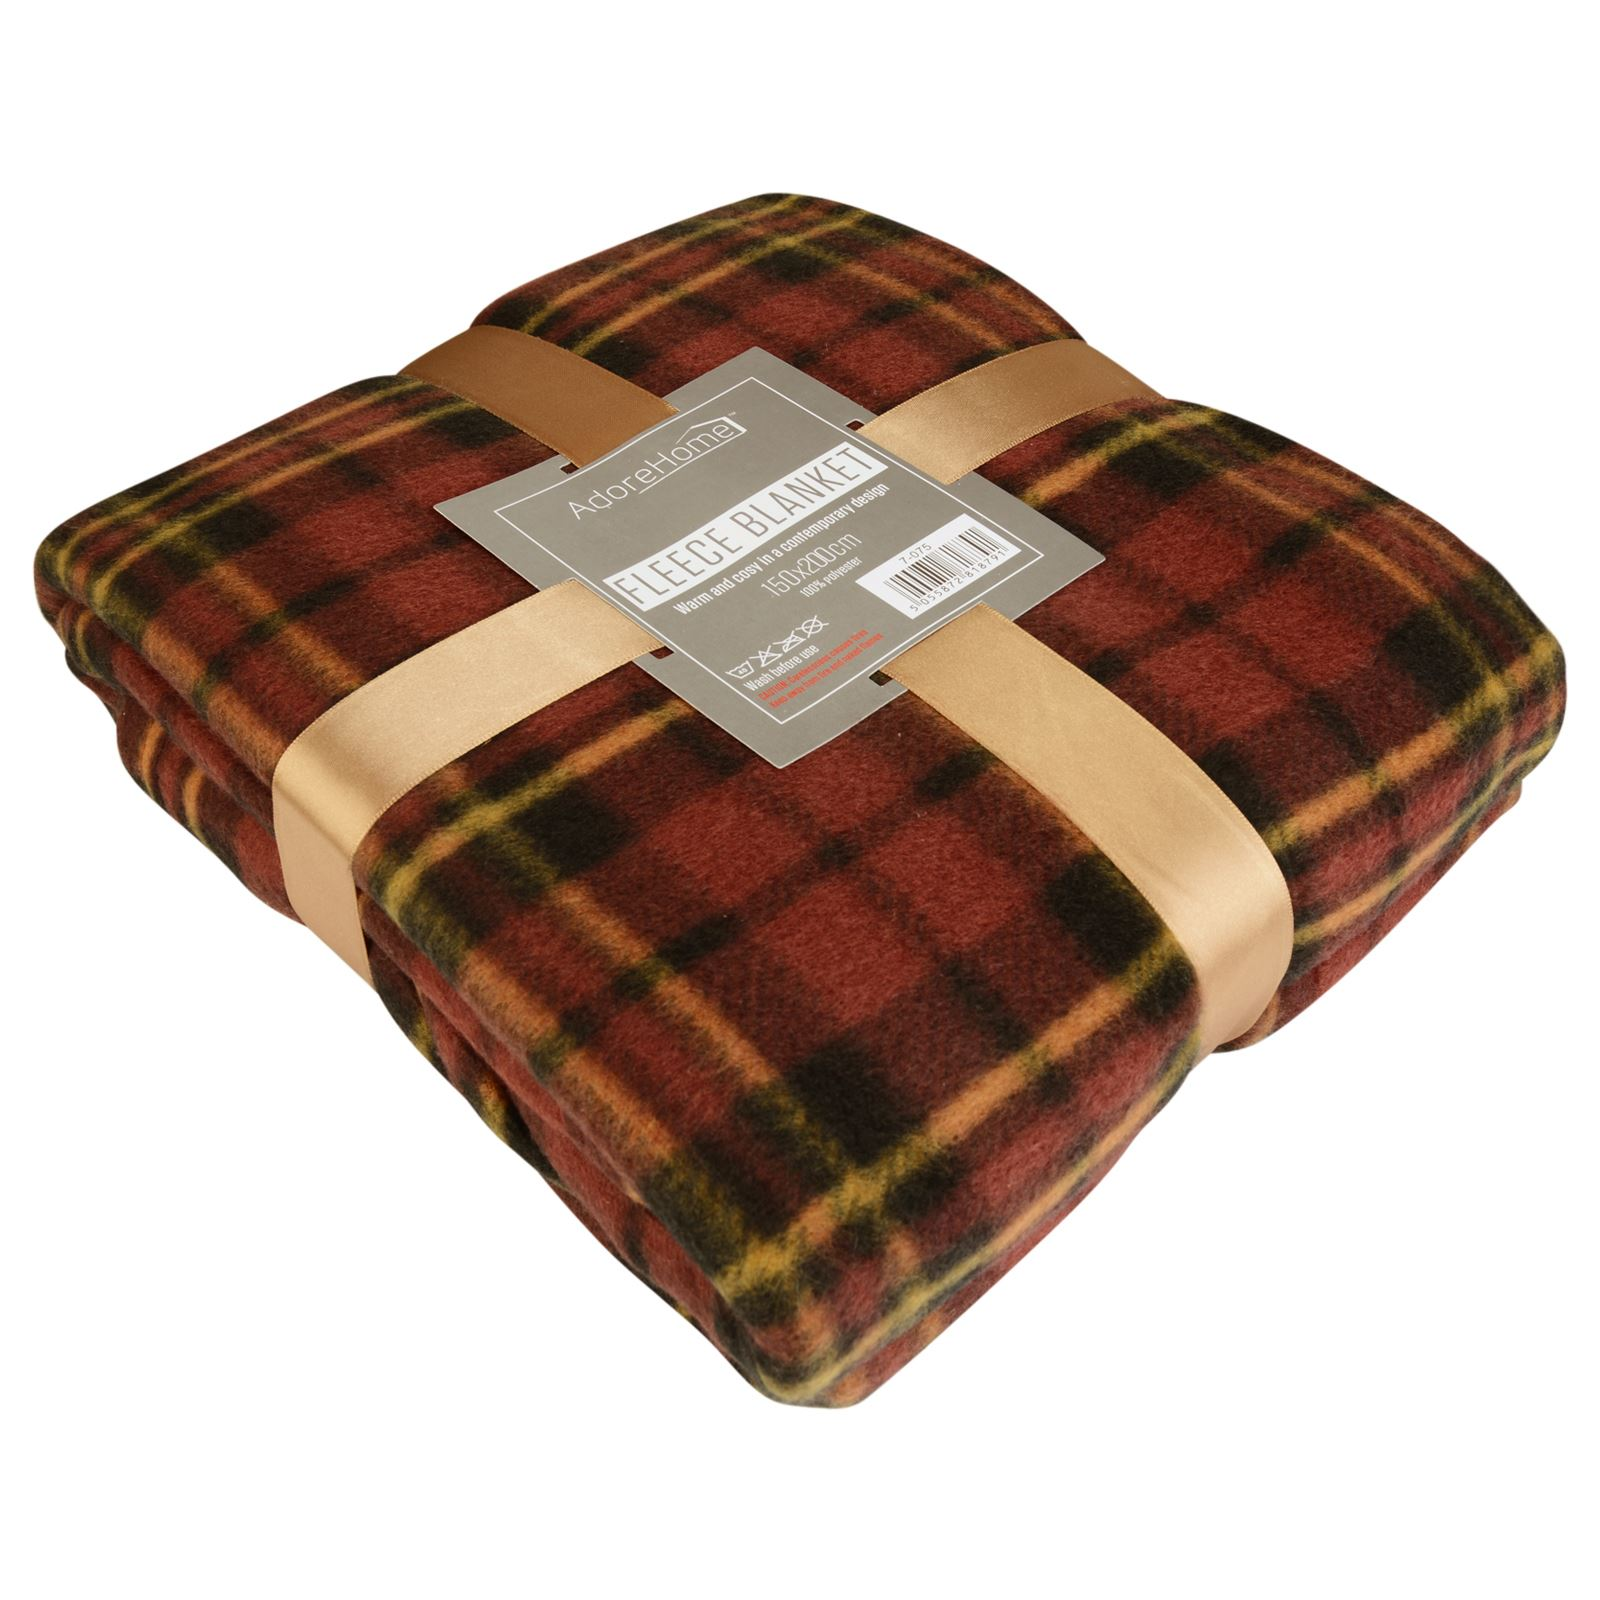 UK Winter Warm Heating Blanket Soft Sofa Tartan Throw Bed Car Travel Cover Cozy